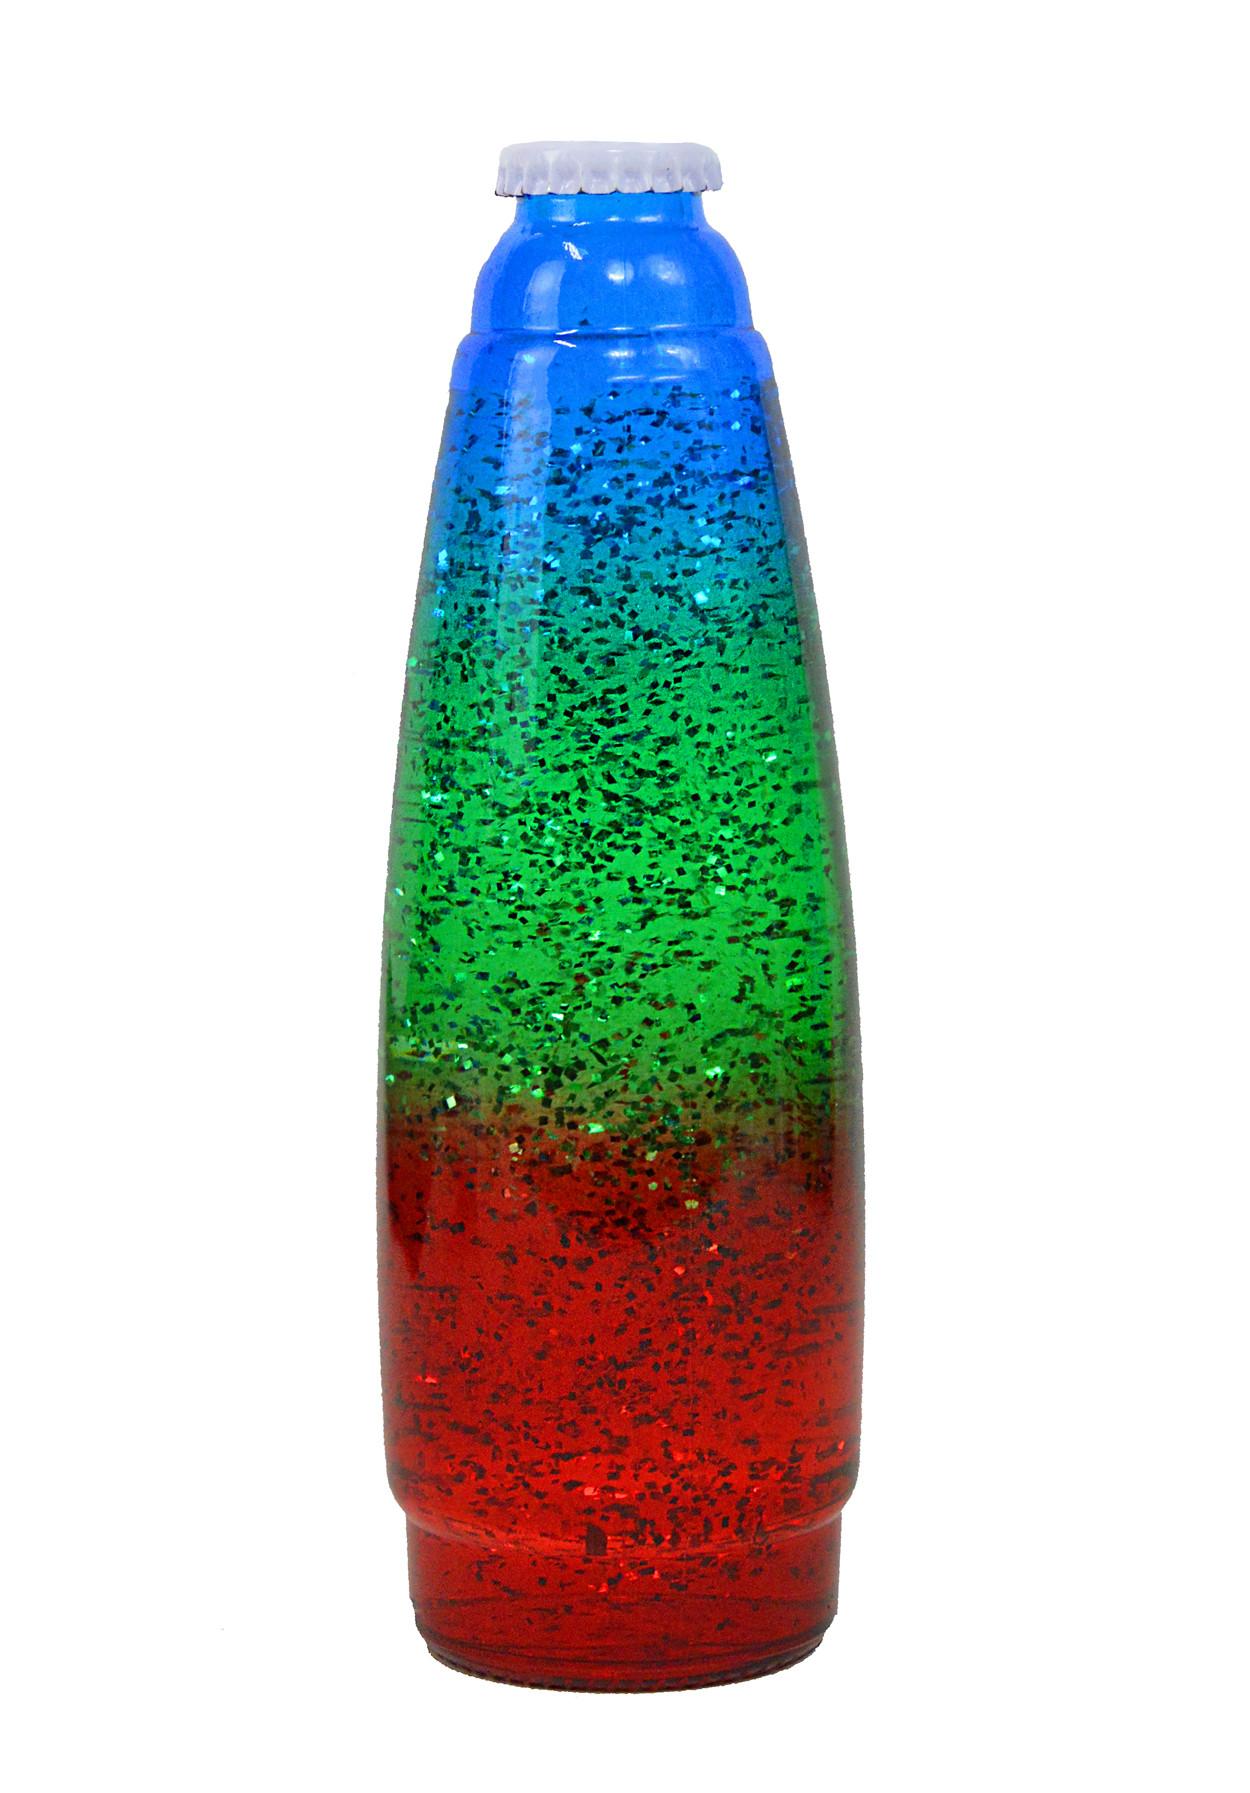 Колба для лава-лампы 35 см Трёхцветная/Блёстки  (20*5,5)